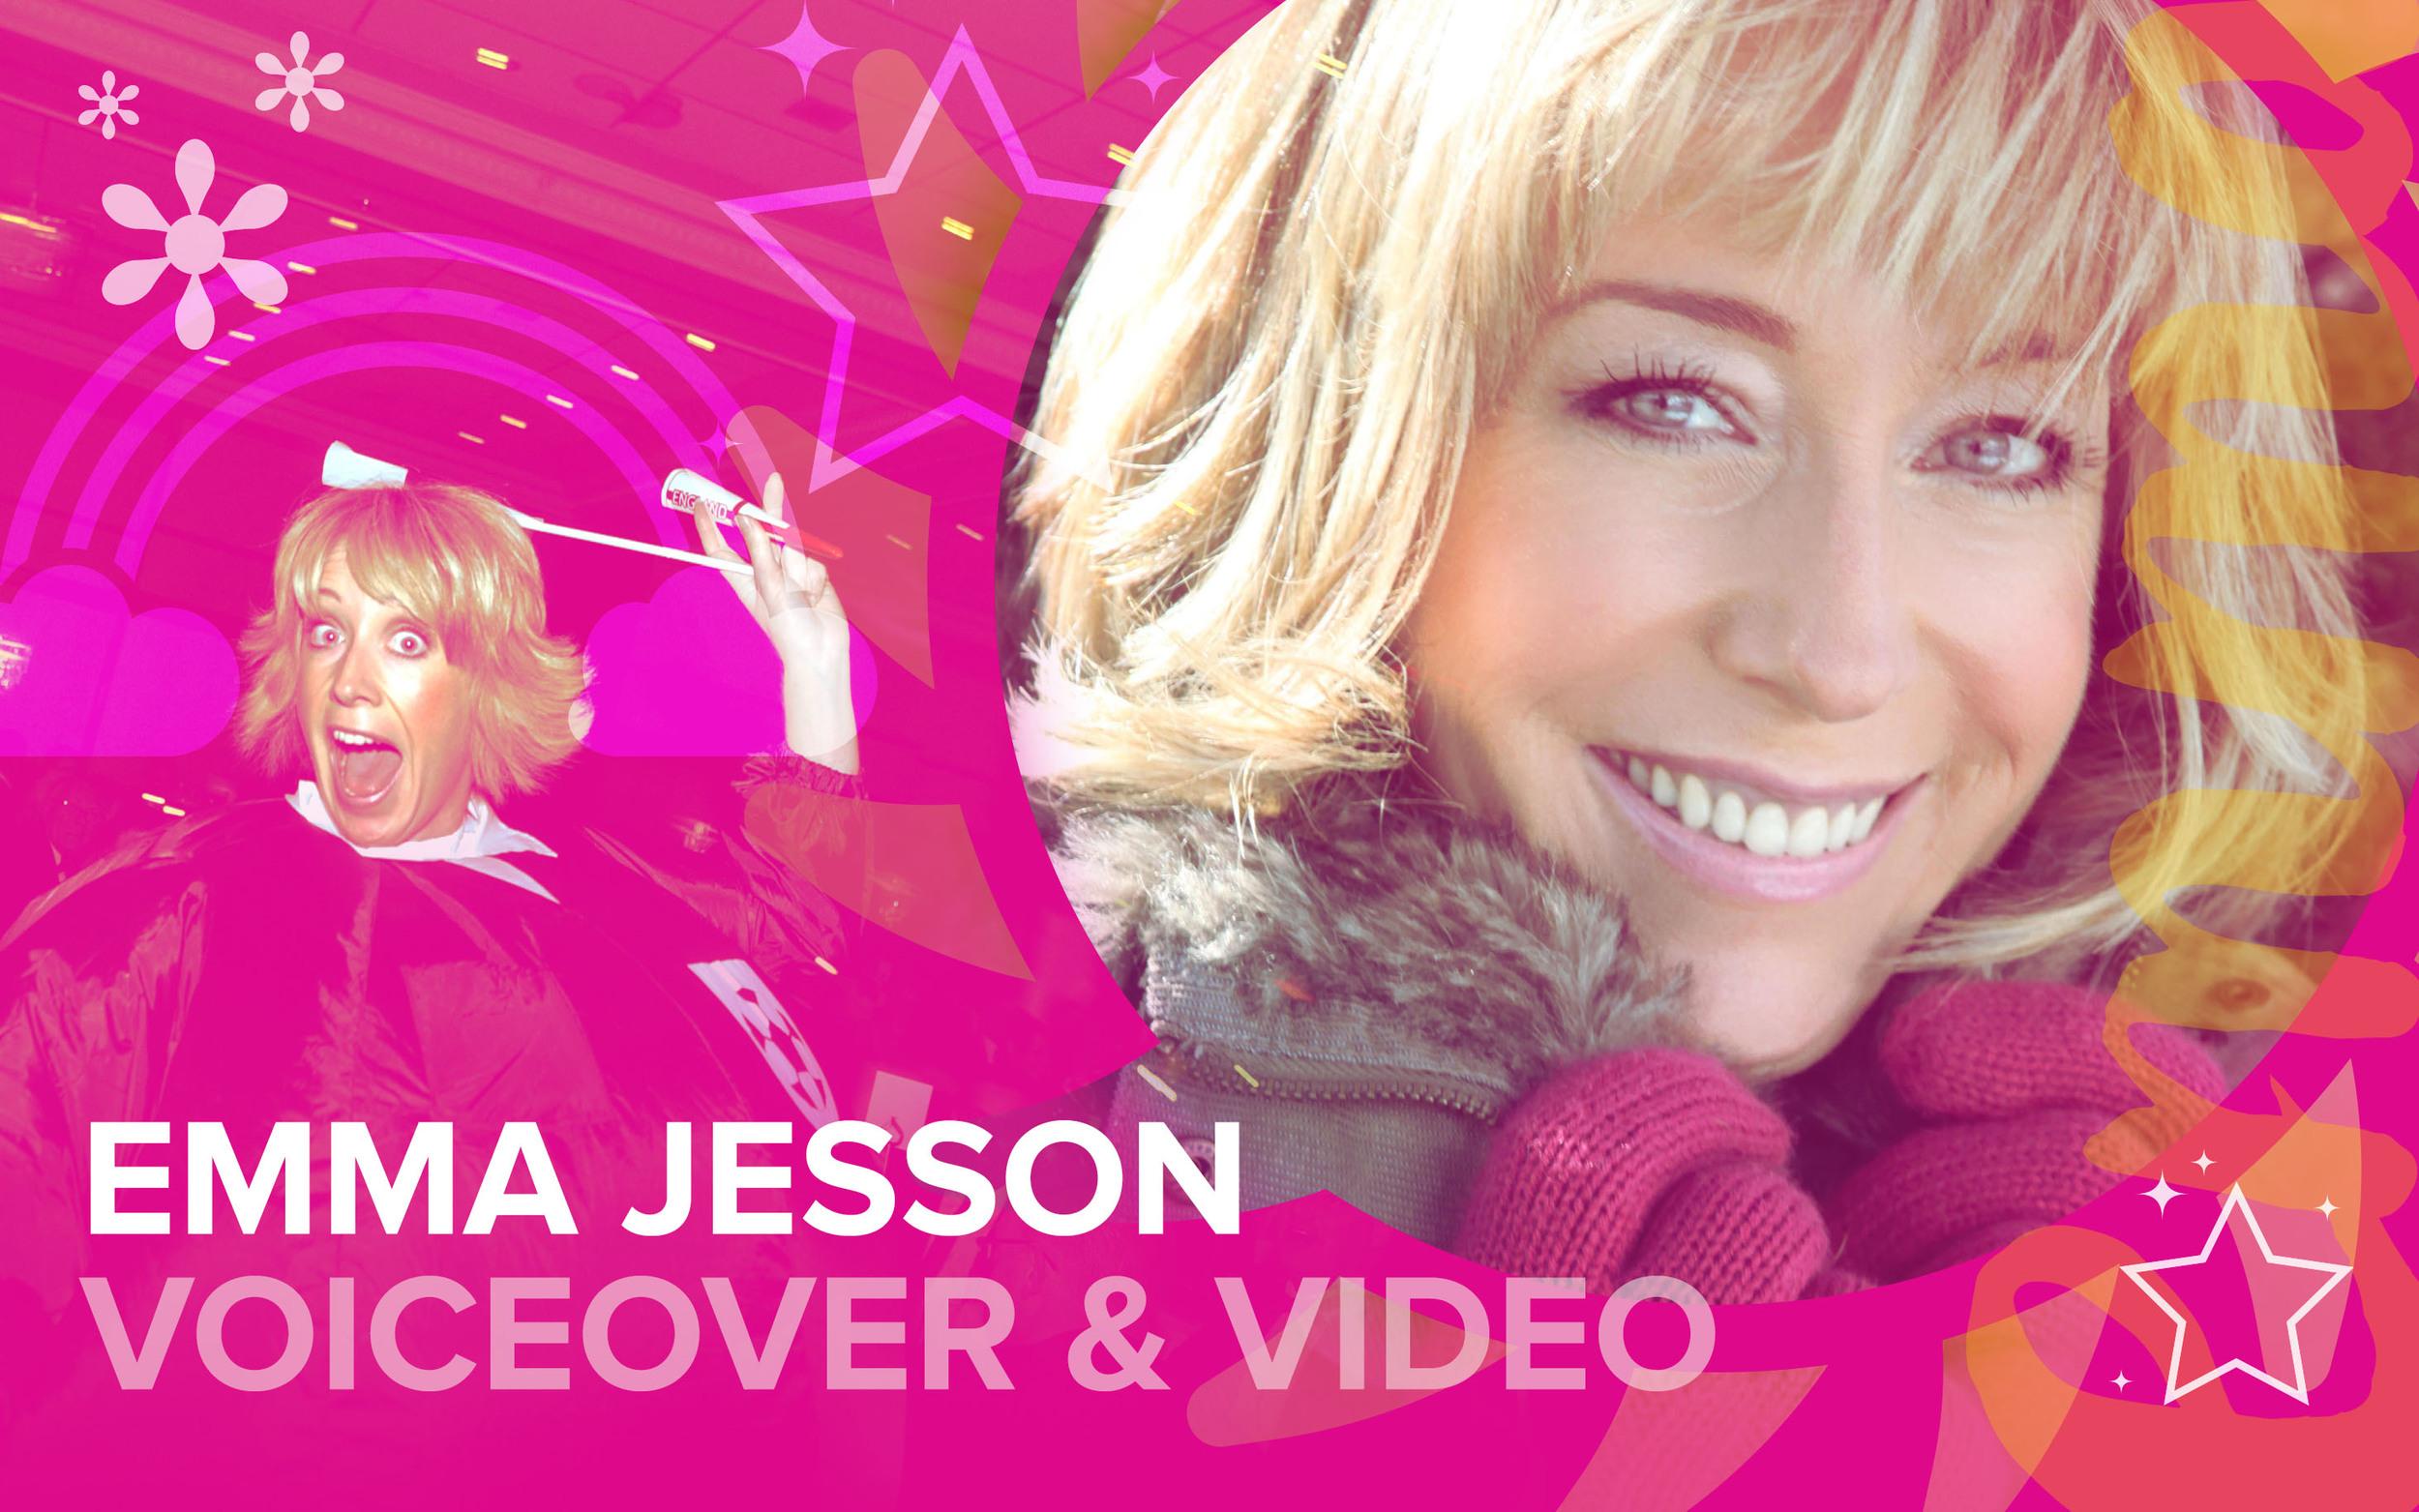 Emma Jesson Voiceover & Video